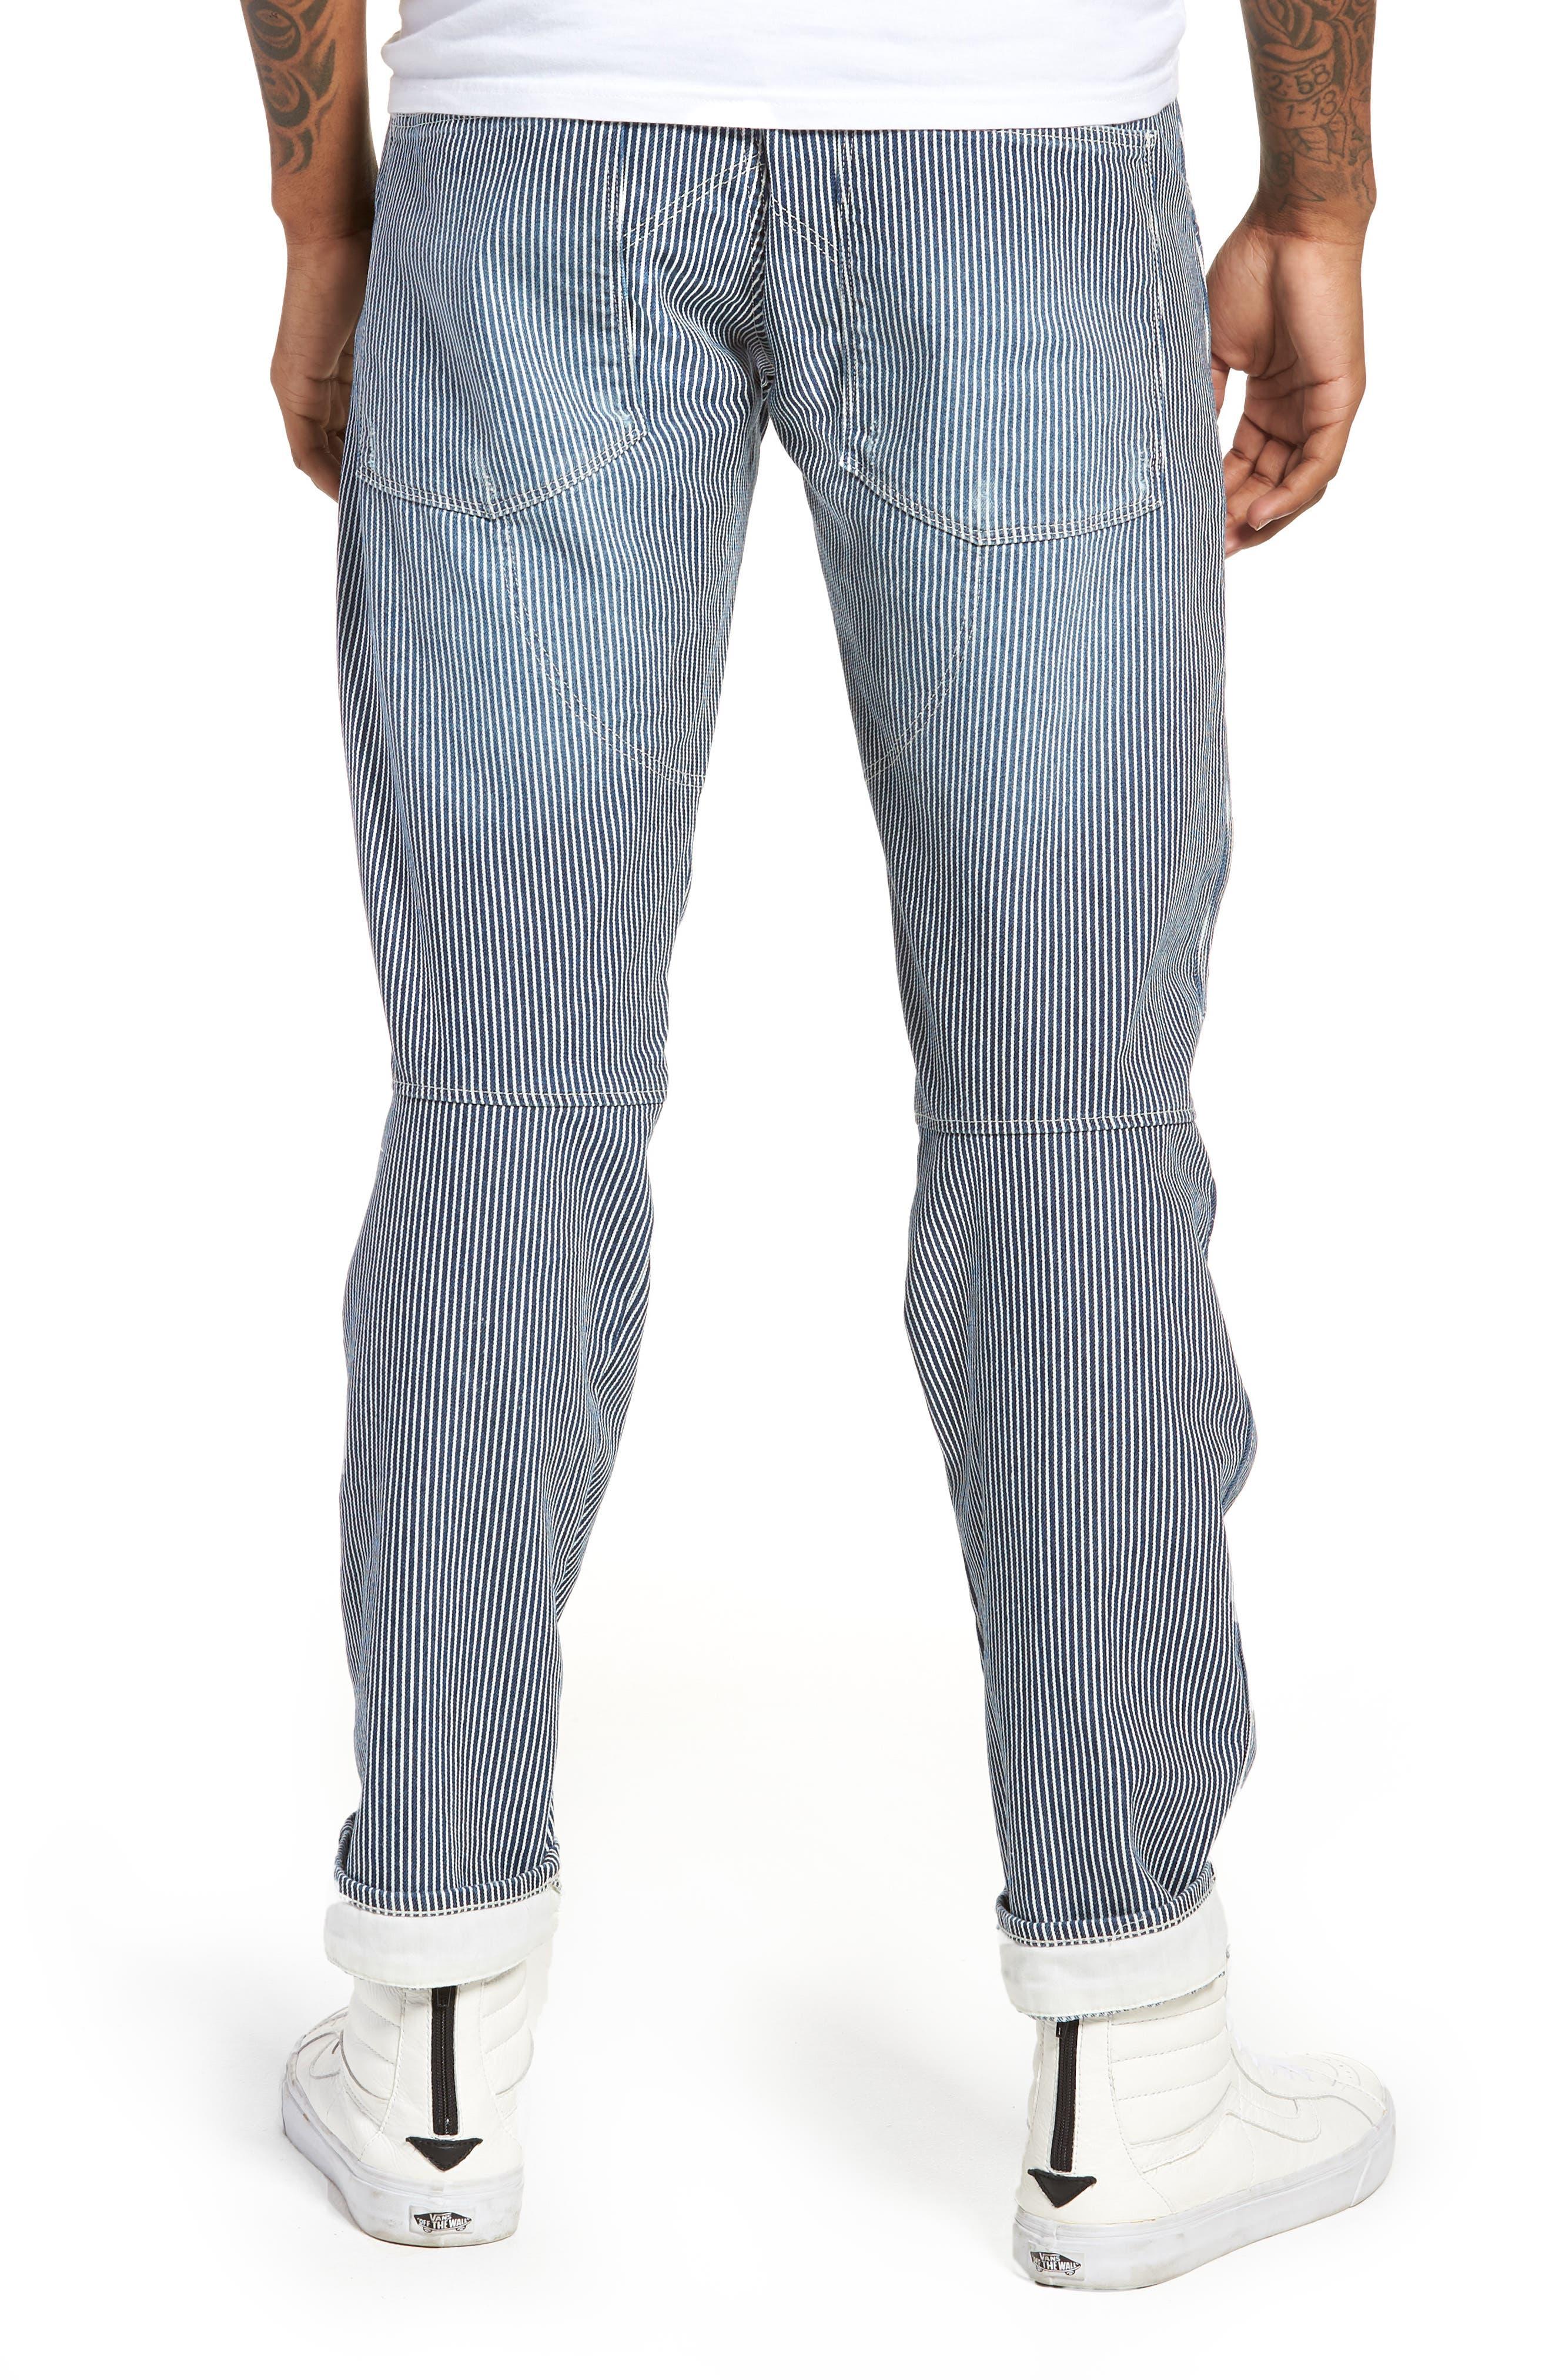 3D Slim Pants,                             Alternate thumbnail 2, color,                             Medium Aged Destroy